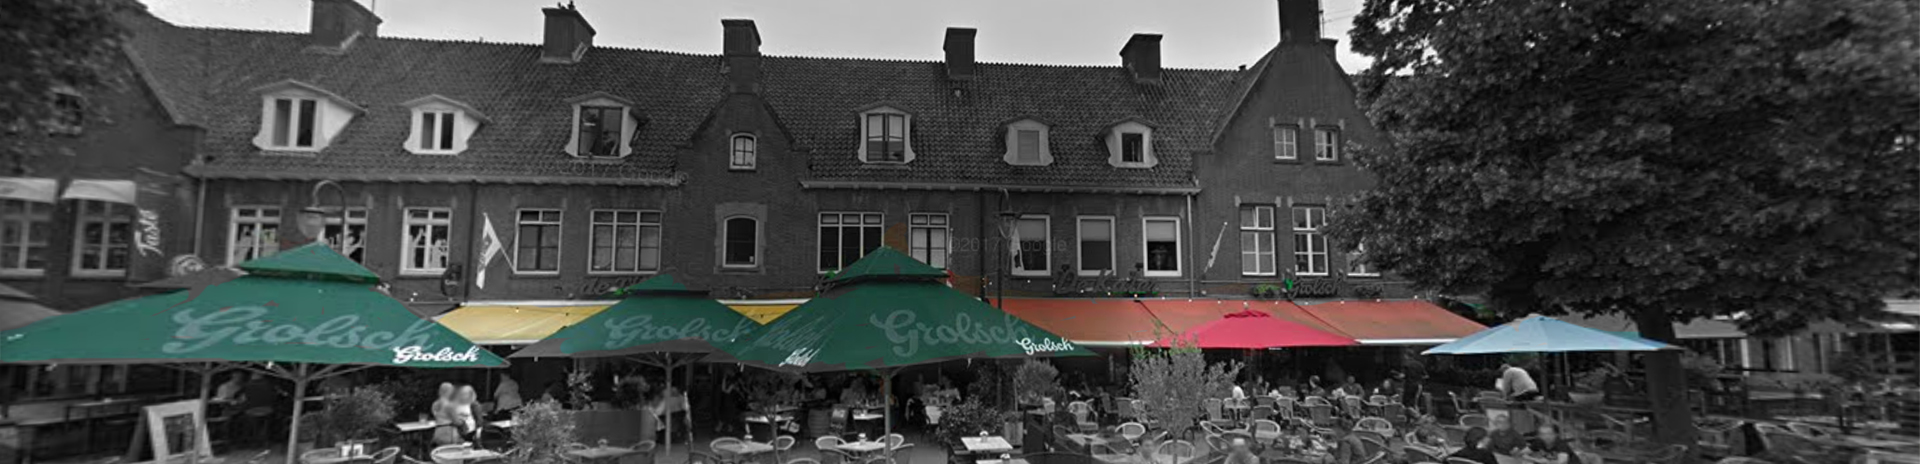 Letselschade Advocaat Wageningen | LetselPro